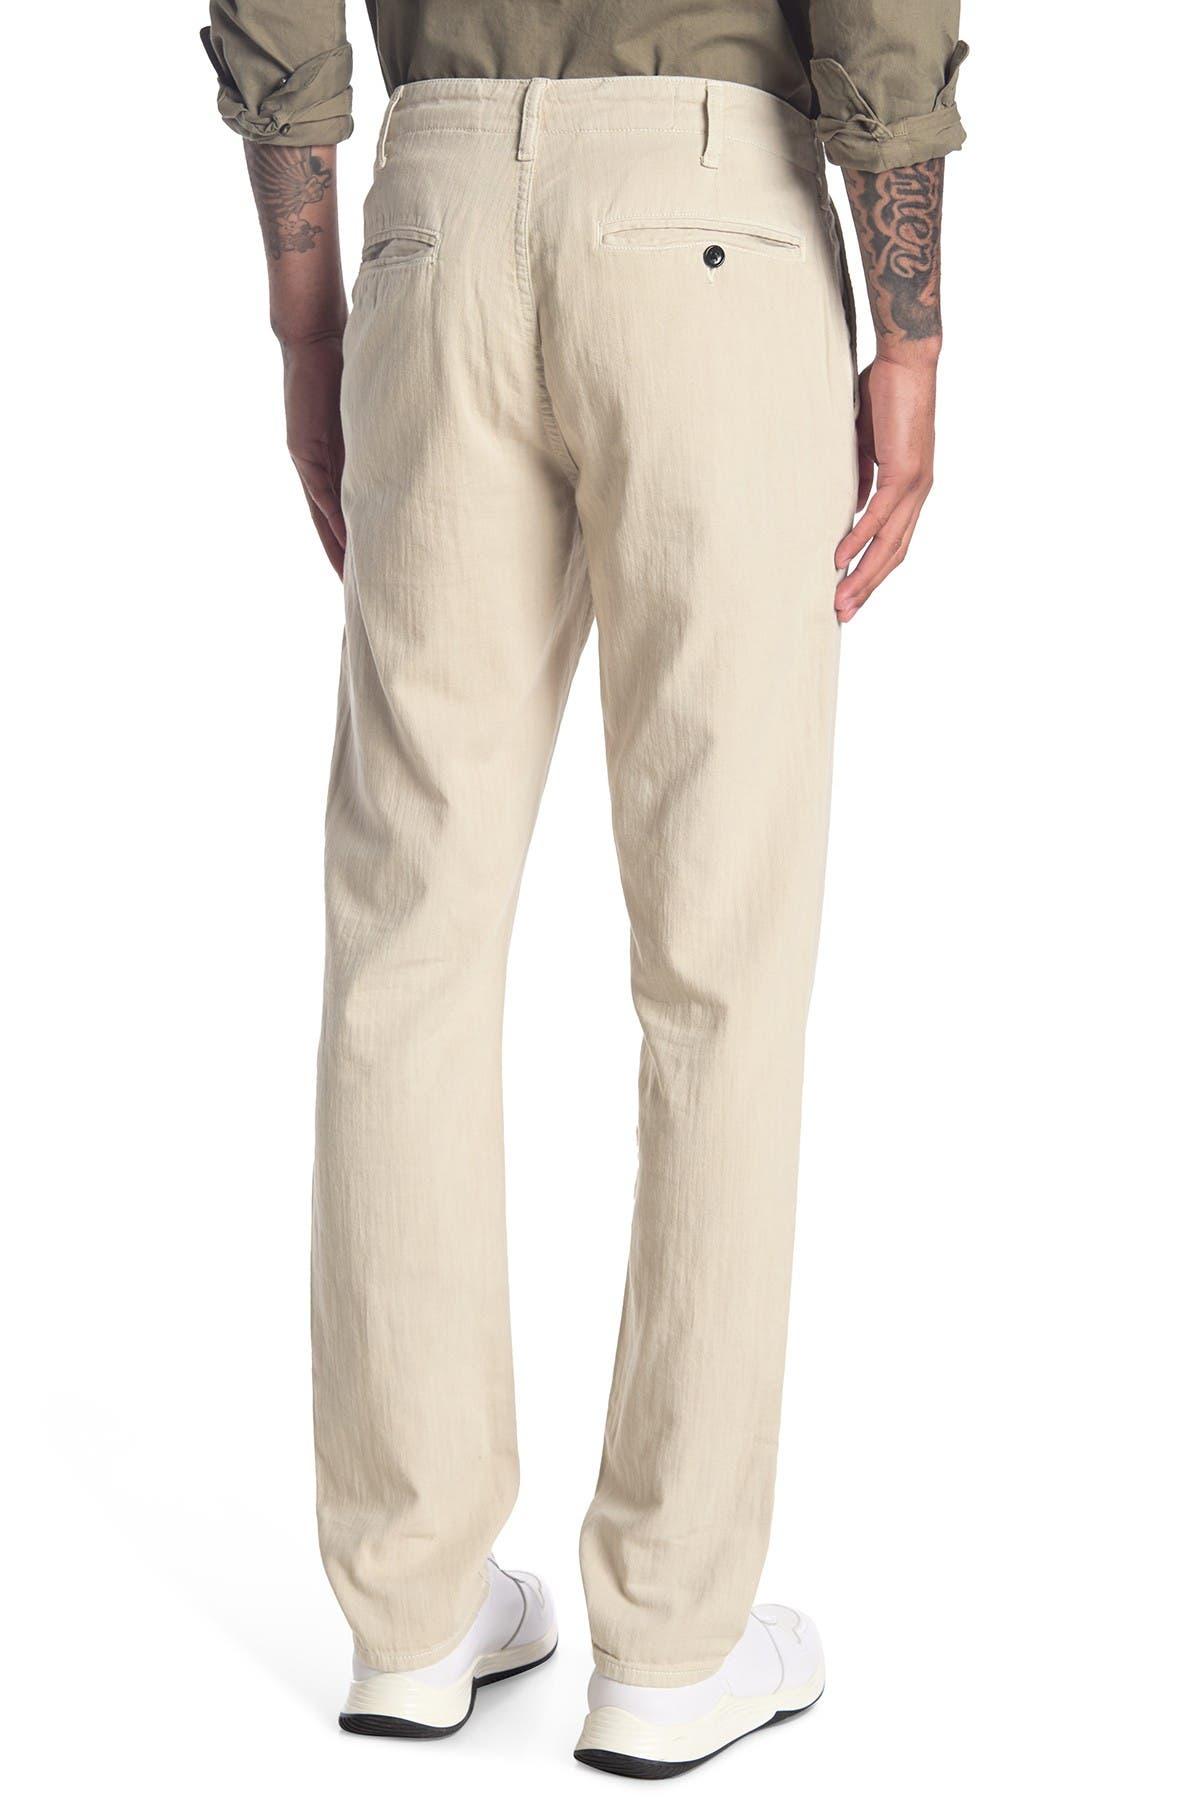 Image of BLDWN Modern Slim Trousers